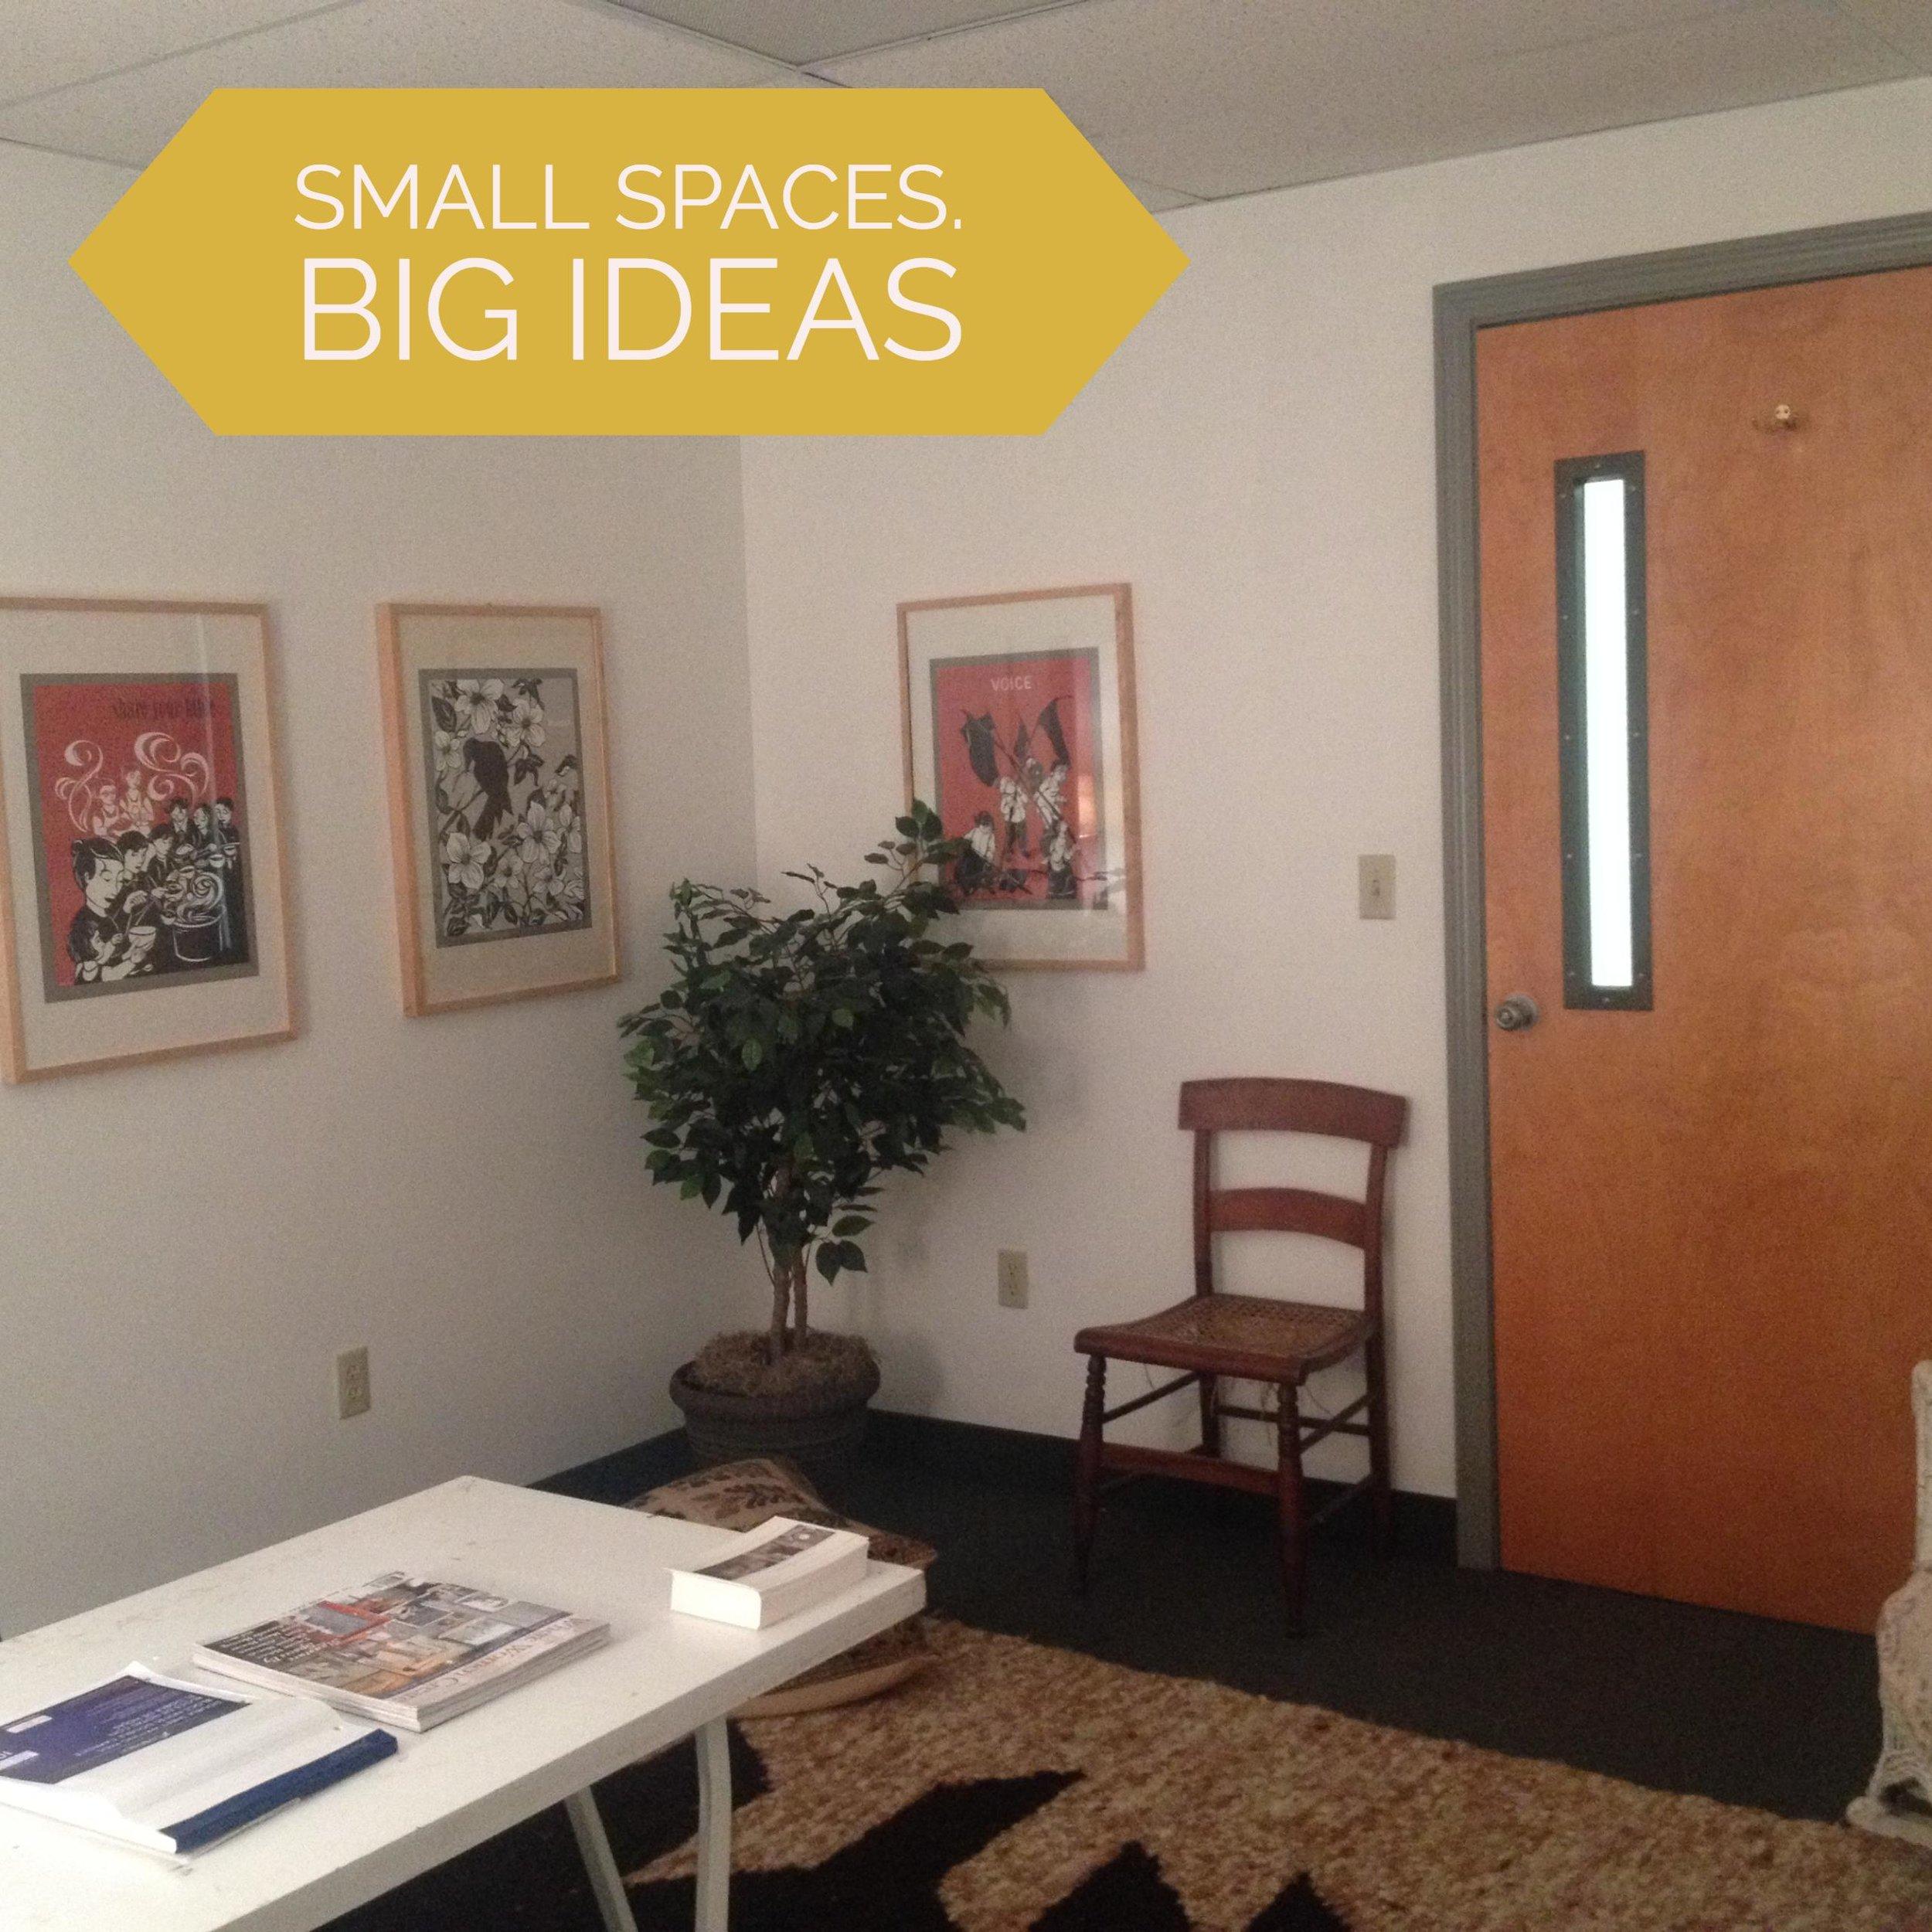 SmallSpacesBigIdeas1.jpg